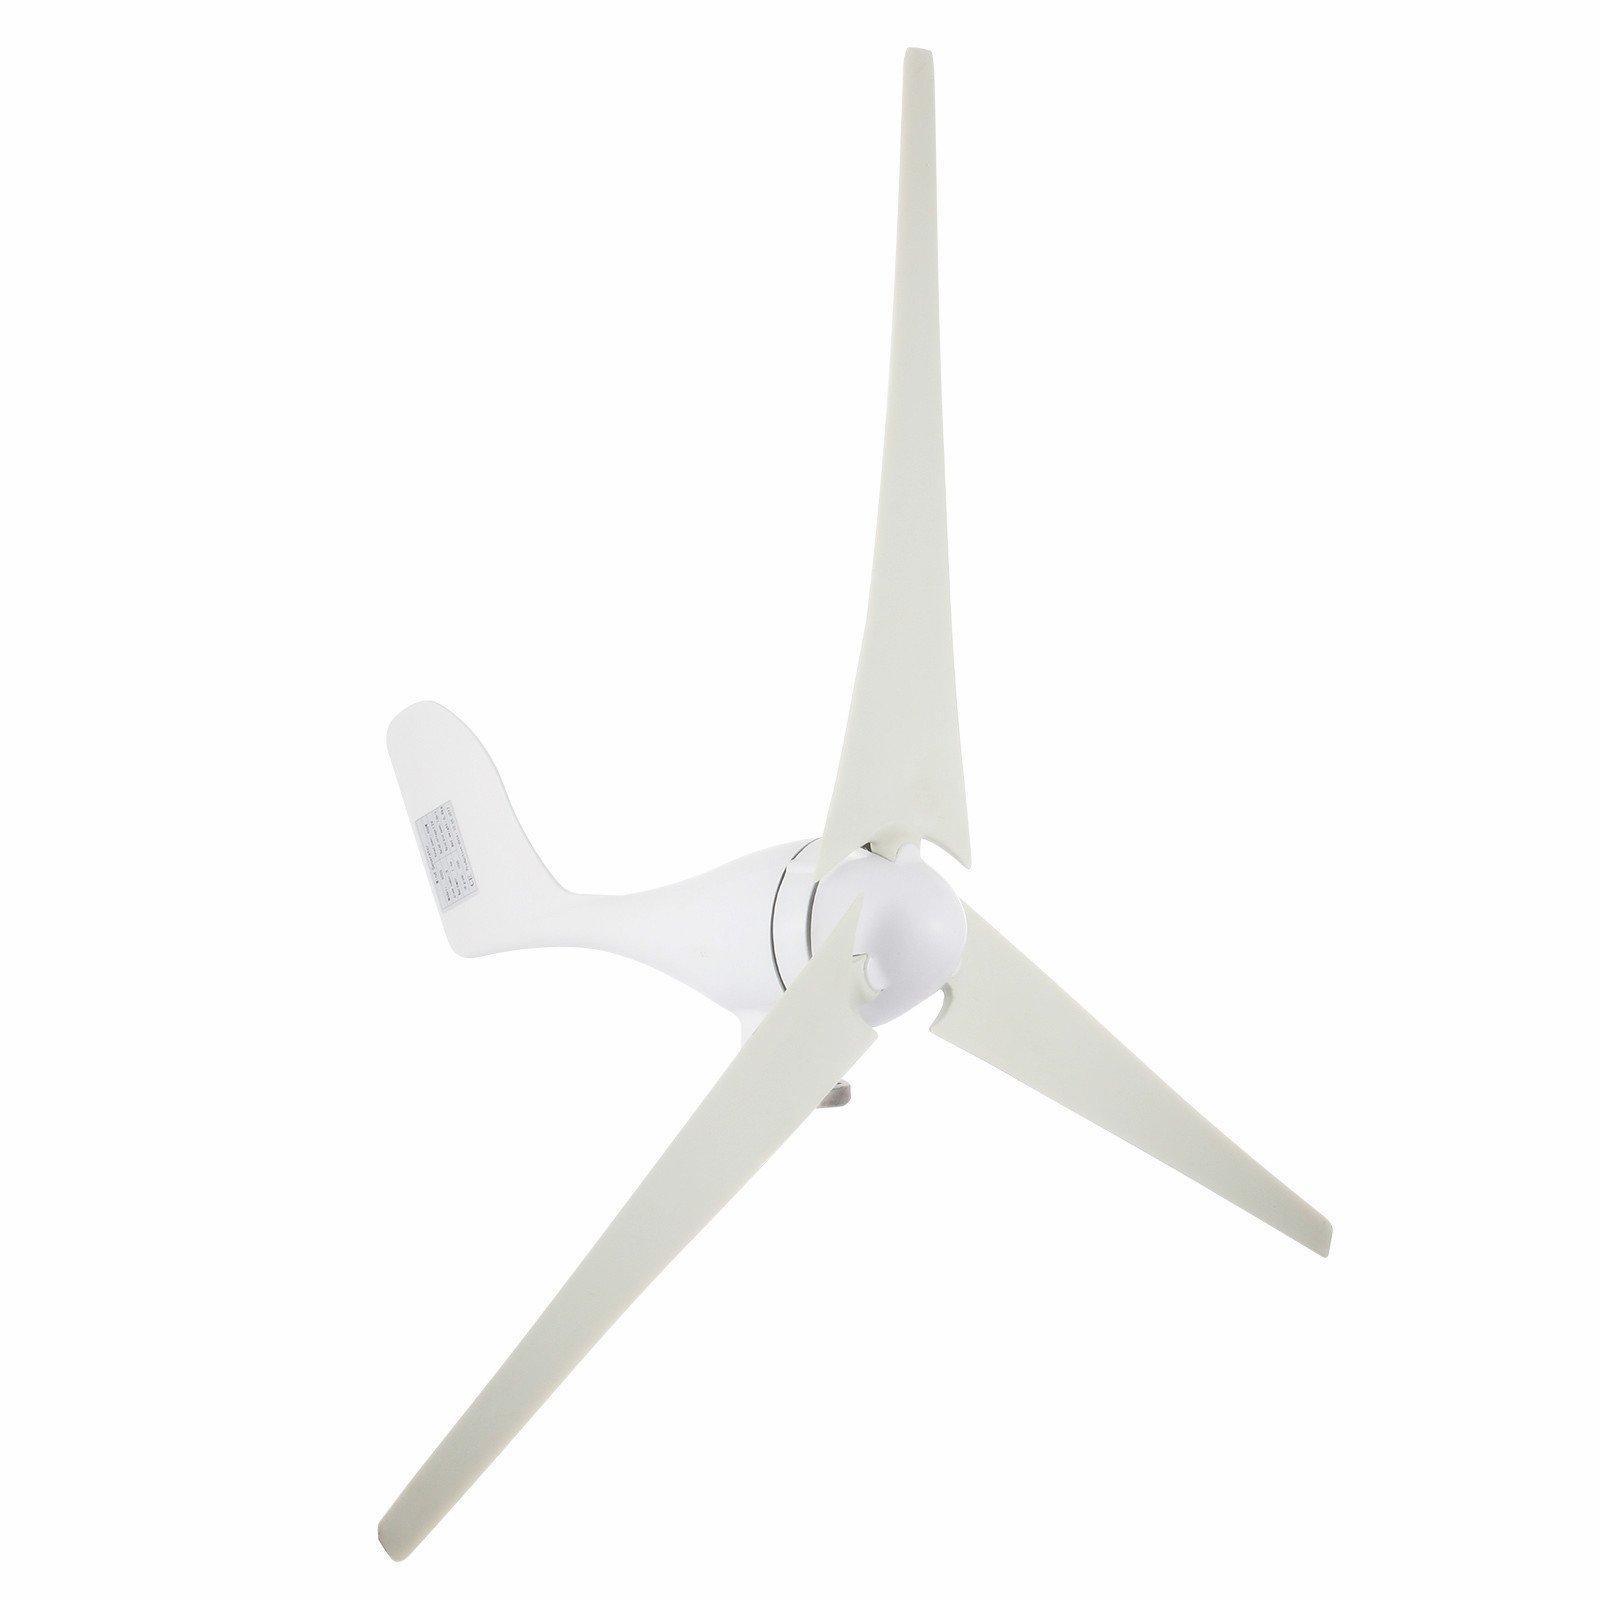 Popsport Wind Generator 400W Hybrid Wind Turbine Generator DC 12V/24V Turbine Wind Generator 3 Blades Light and Powerful Wind Generator Kit for Home Use (400W)